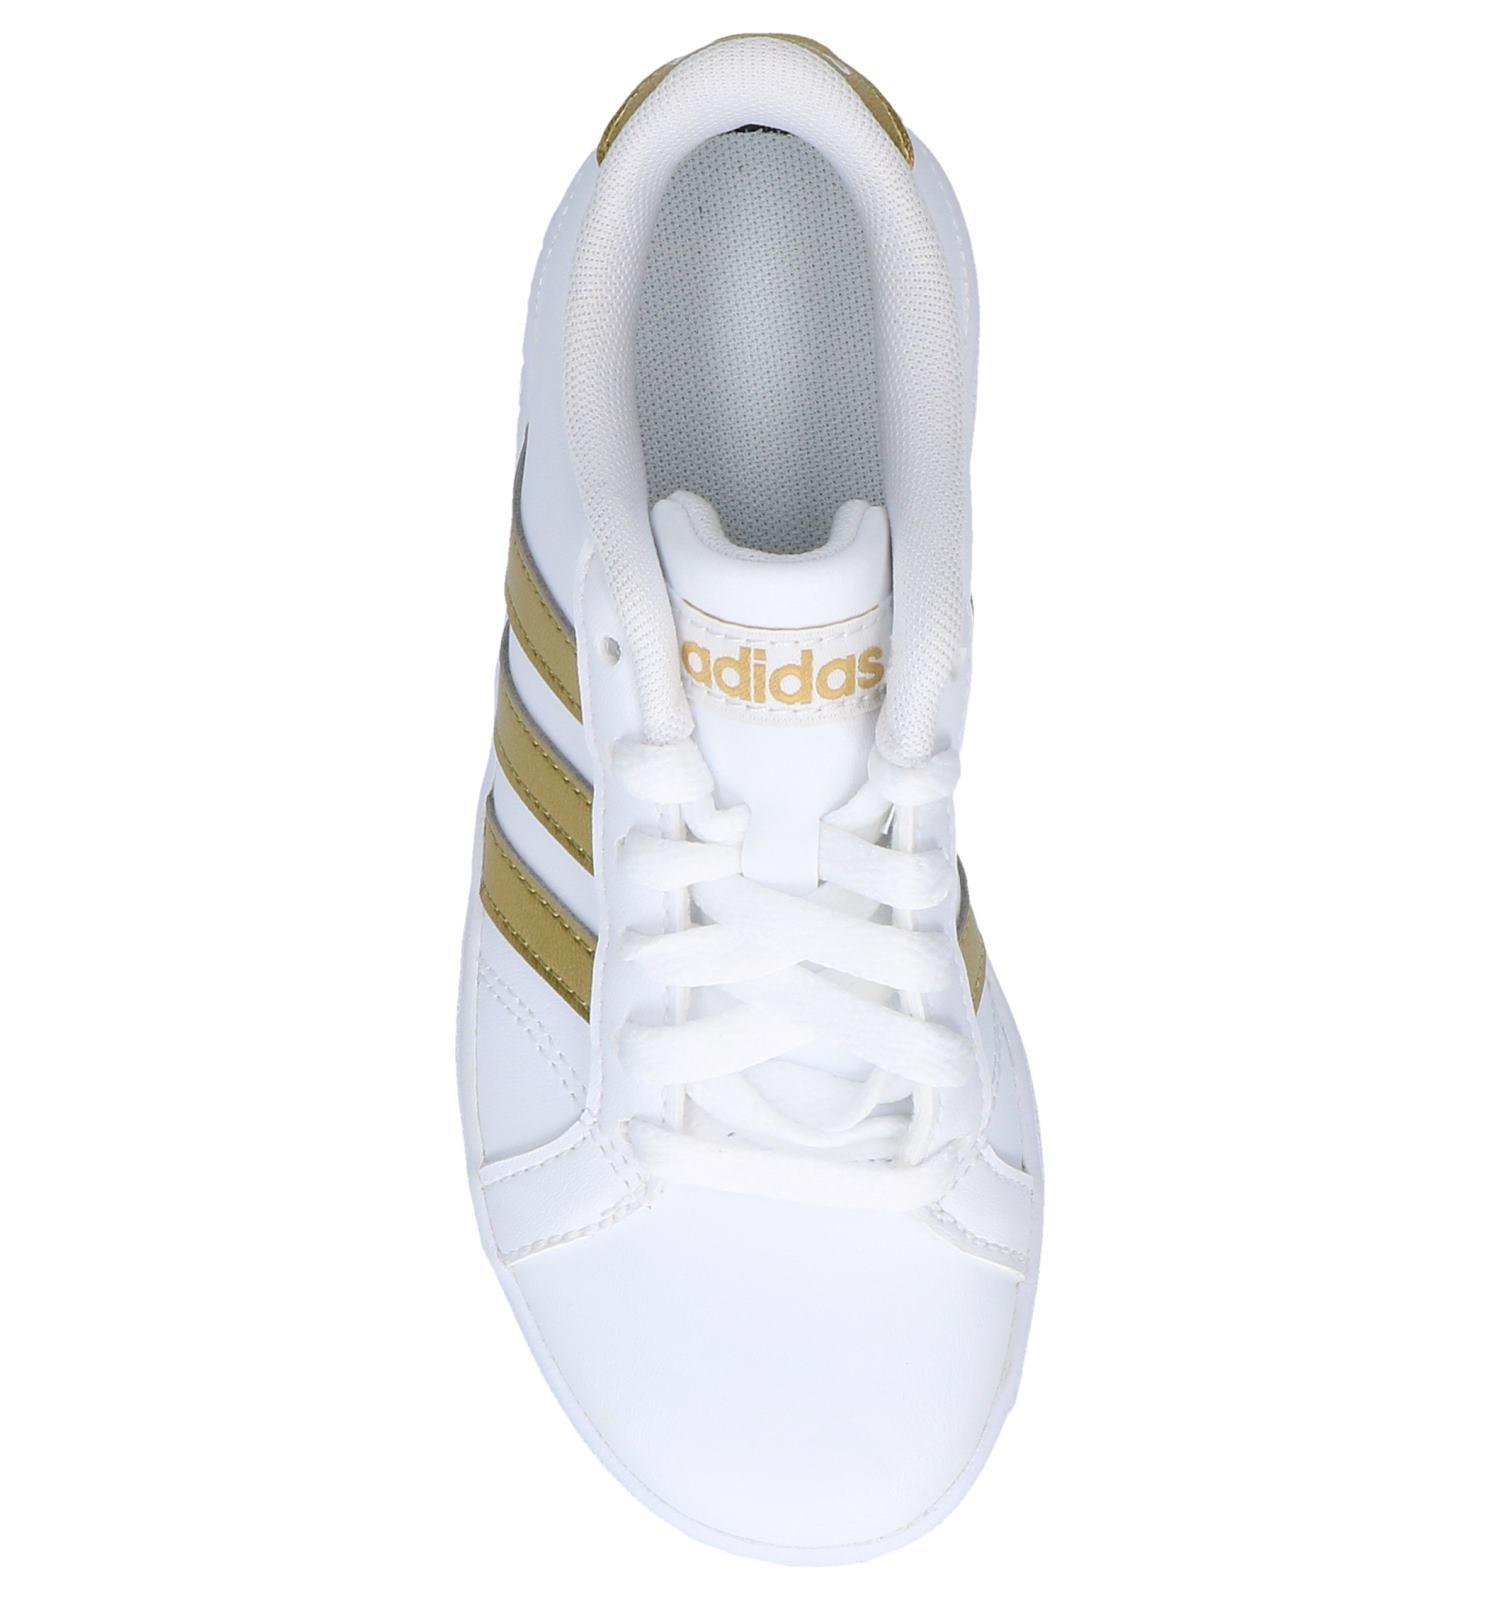 9e2b433d521 Sneakers Lage Adidas Baseline Gratis Verzend En be Witte Torfs gW7Ozng4